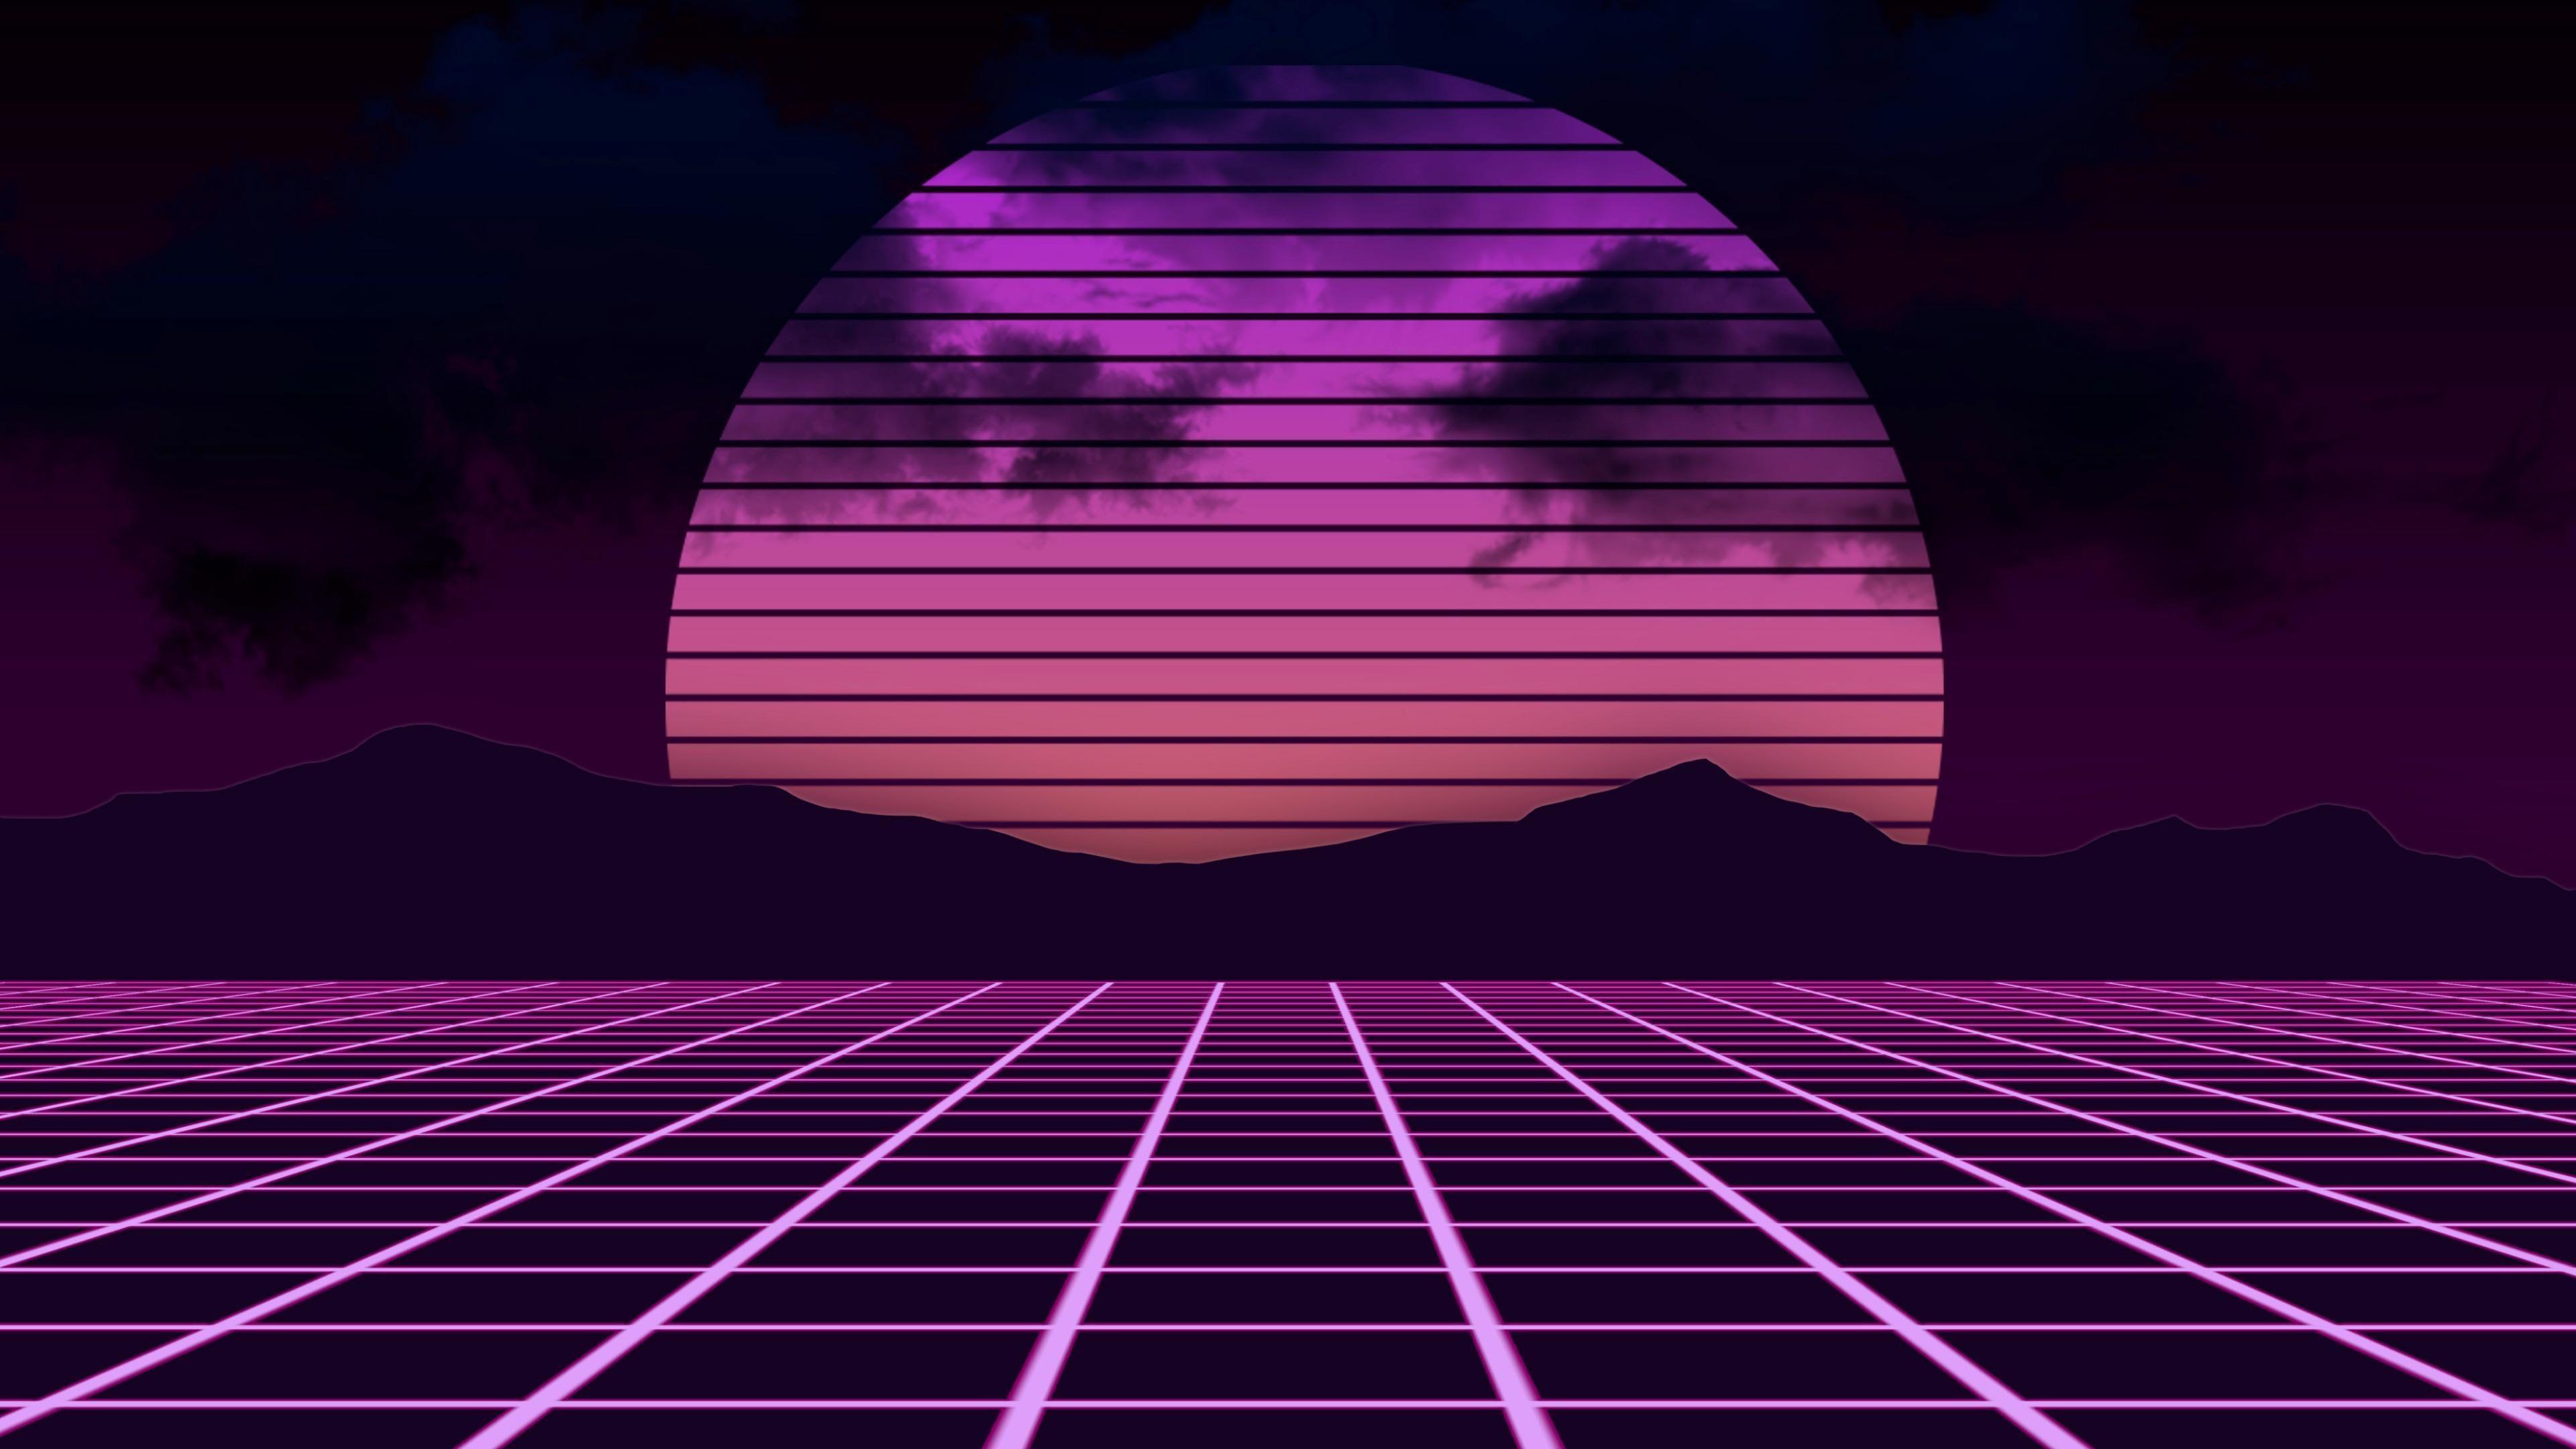 Wallpaper Magenta Vaporwave Digital Art Web Synthwave Symmetry Net Neon Wallpaper Synthwave Vaporwave